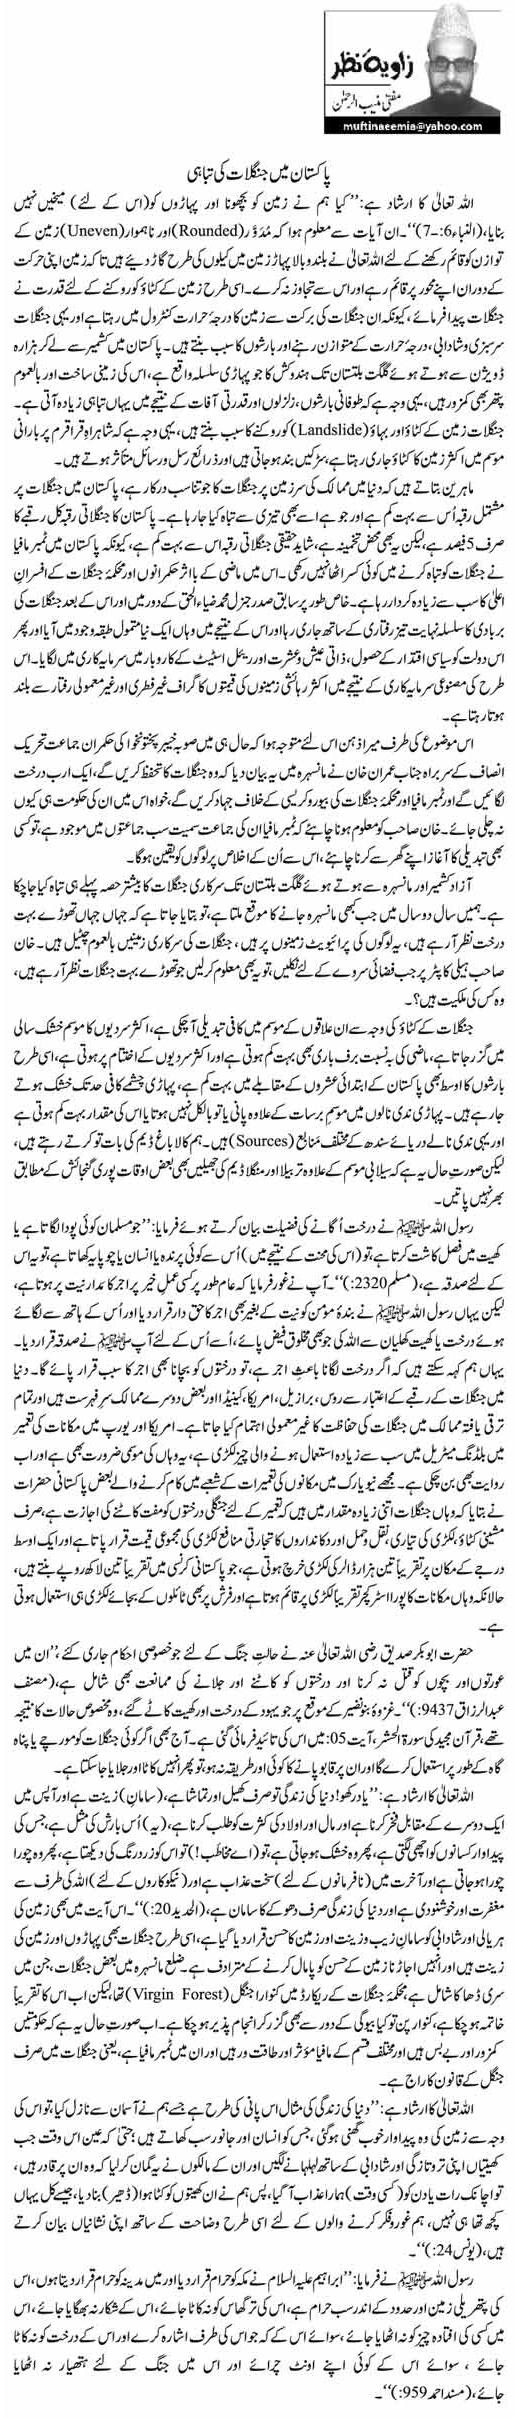 Pakistan mai Junglat Ki Tabahi - Mufti Muneeb - Pakfunny